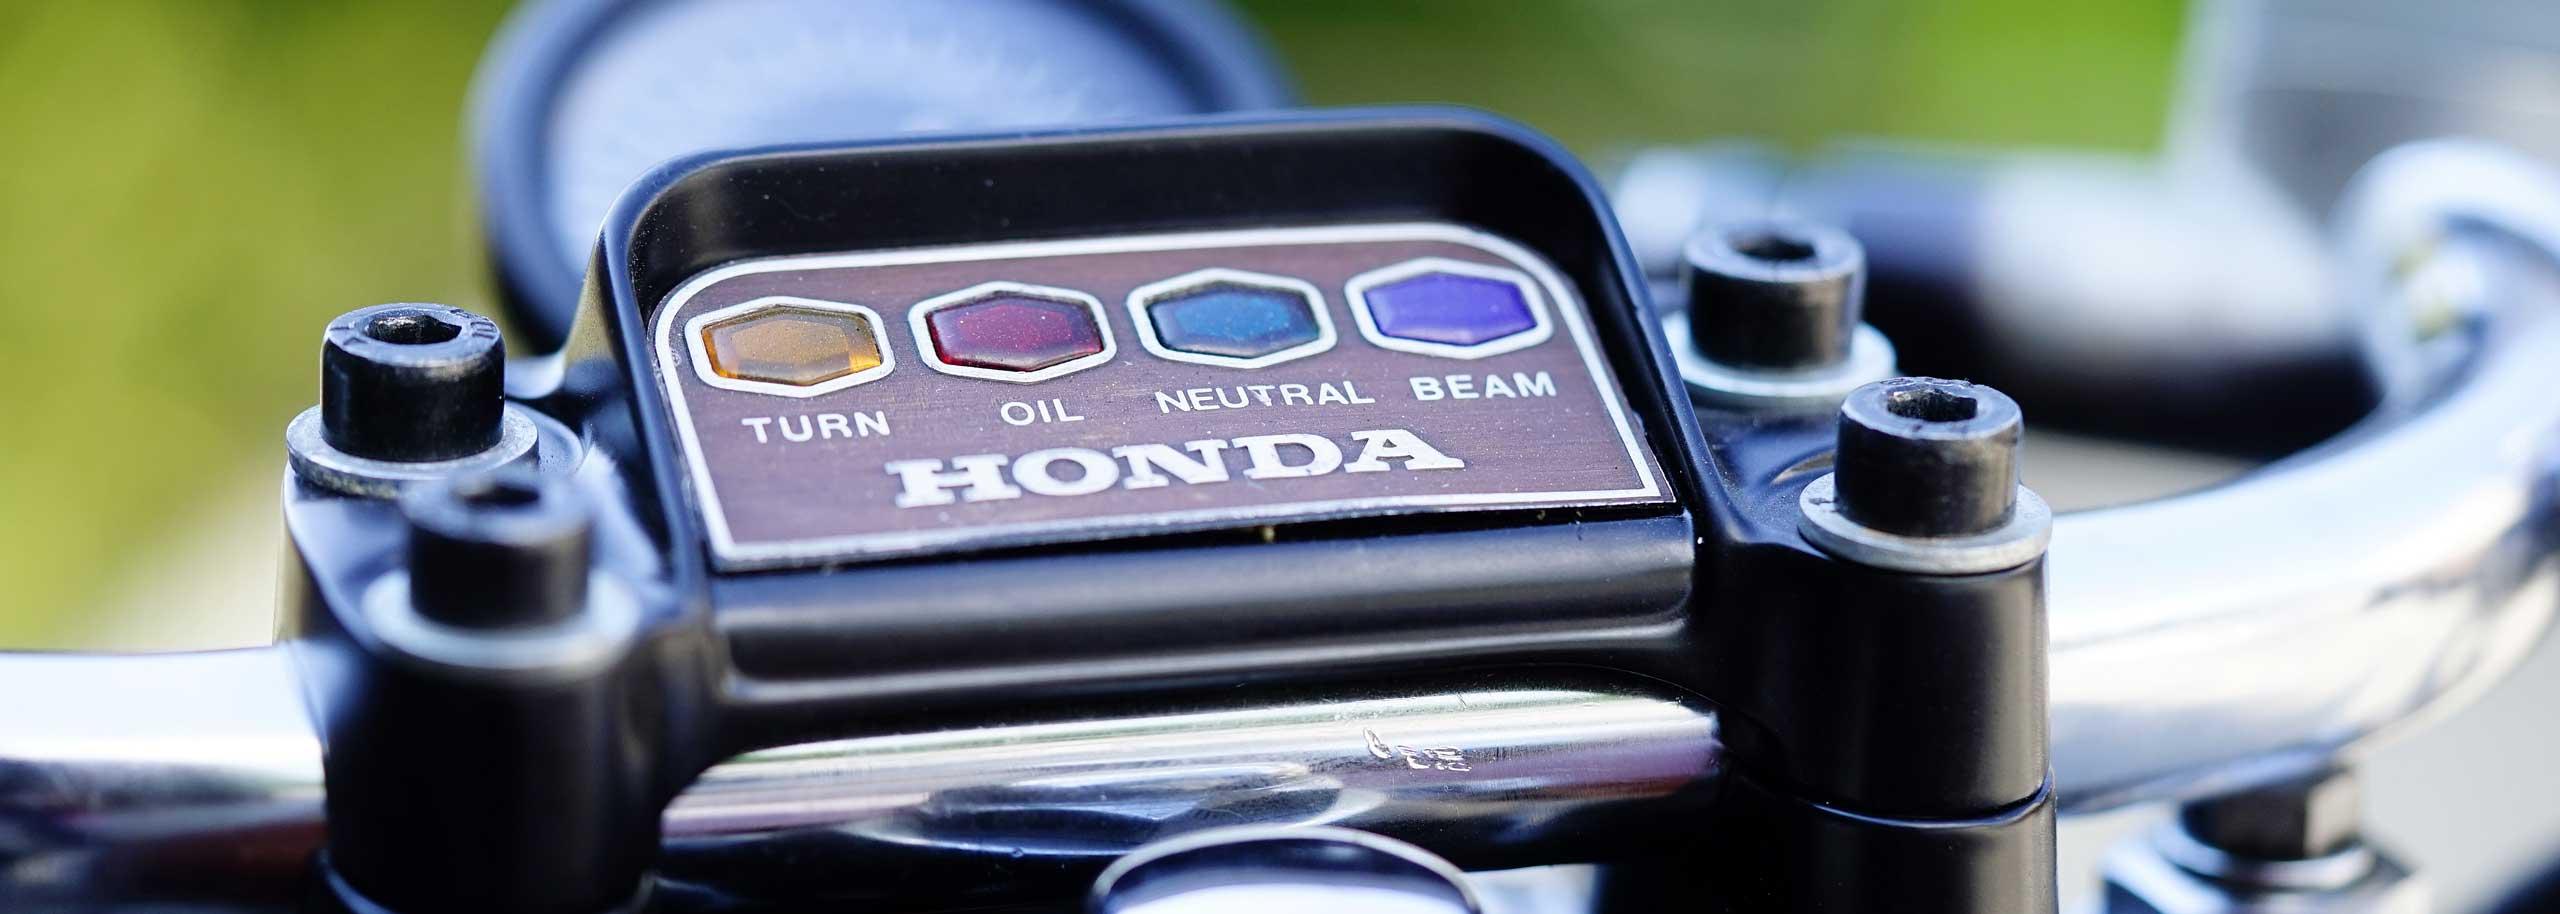 02_TITAN-SAKURA_Honda-CB500-Four_Cafe-Racer-Graz-Motorrad-Umbau-Austria-Vintage_Custom-Bikes_Zweirad_Vierzylinder_Auspuff-Heck-Sattel-Classic